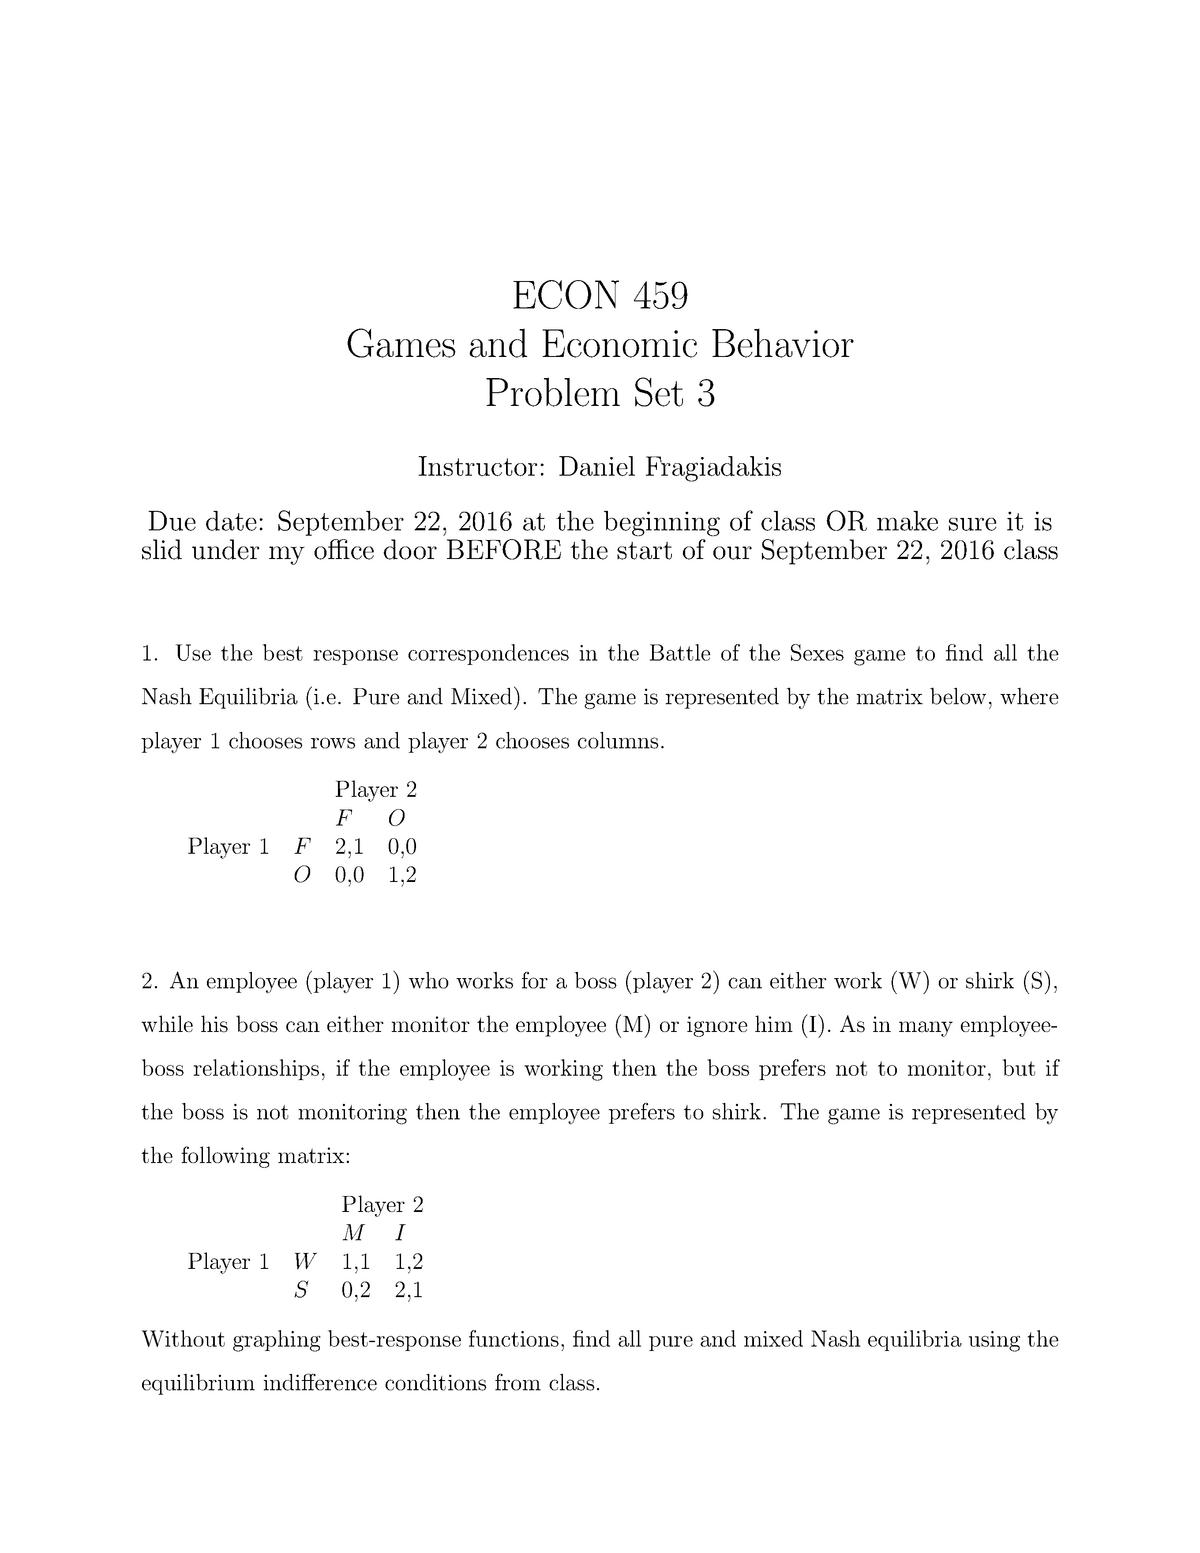 Seminar assignments - Homework 3 - ECON 459 - TAMU - StuDocu